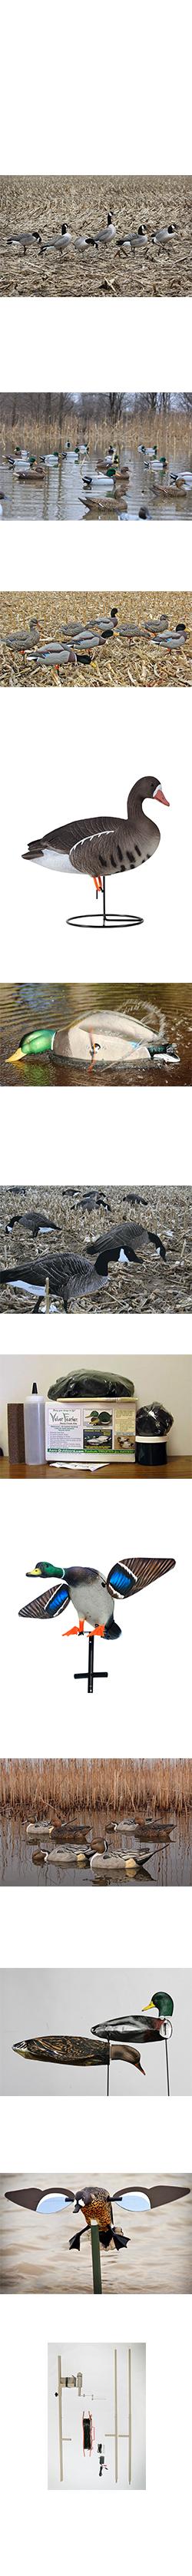 Fooling Birds: Duck & Goose Decoys